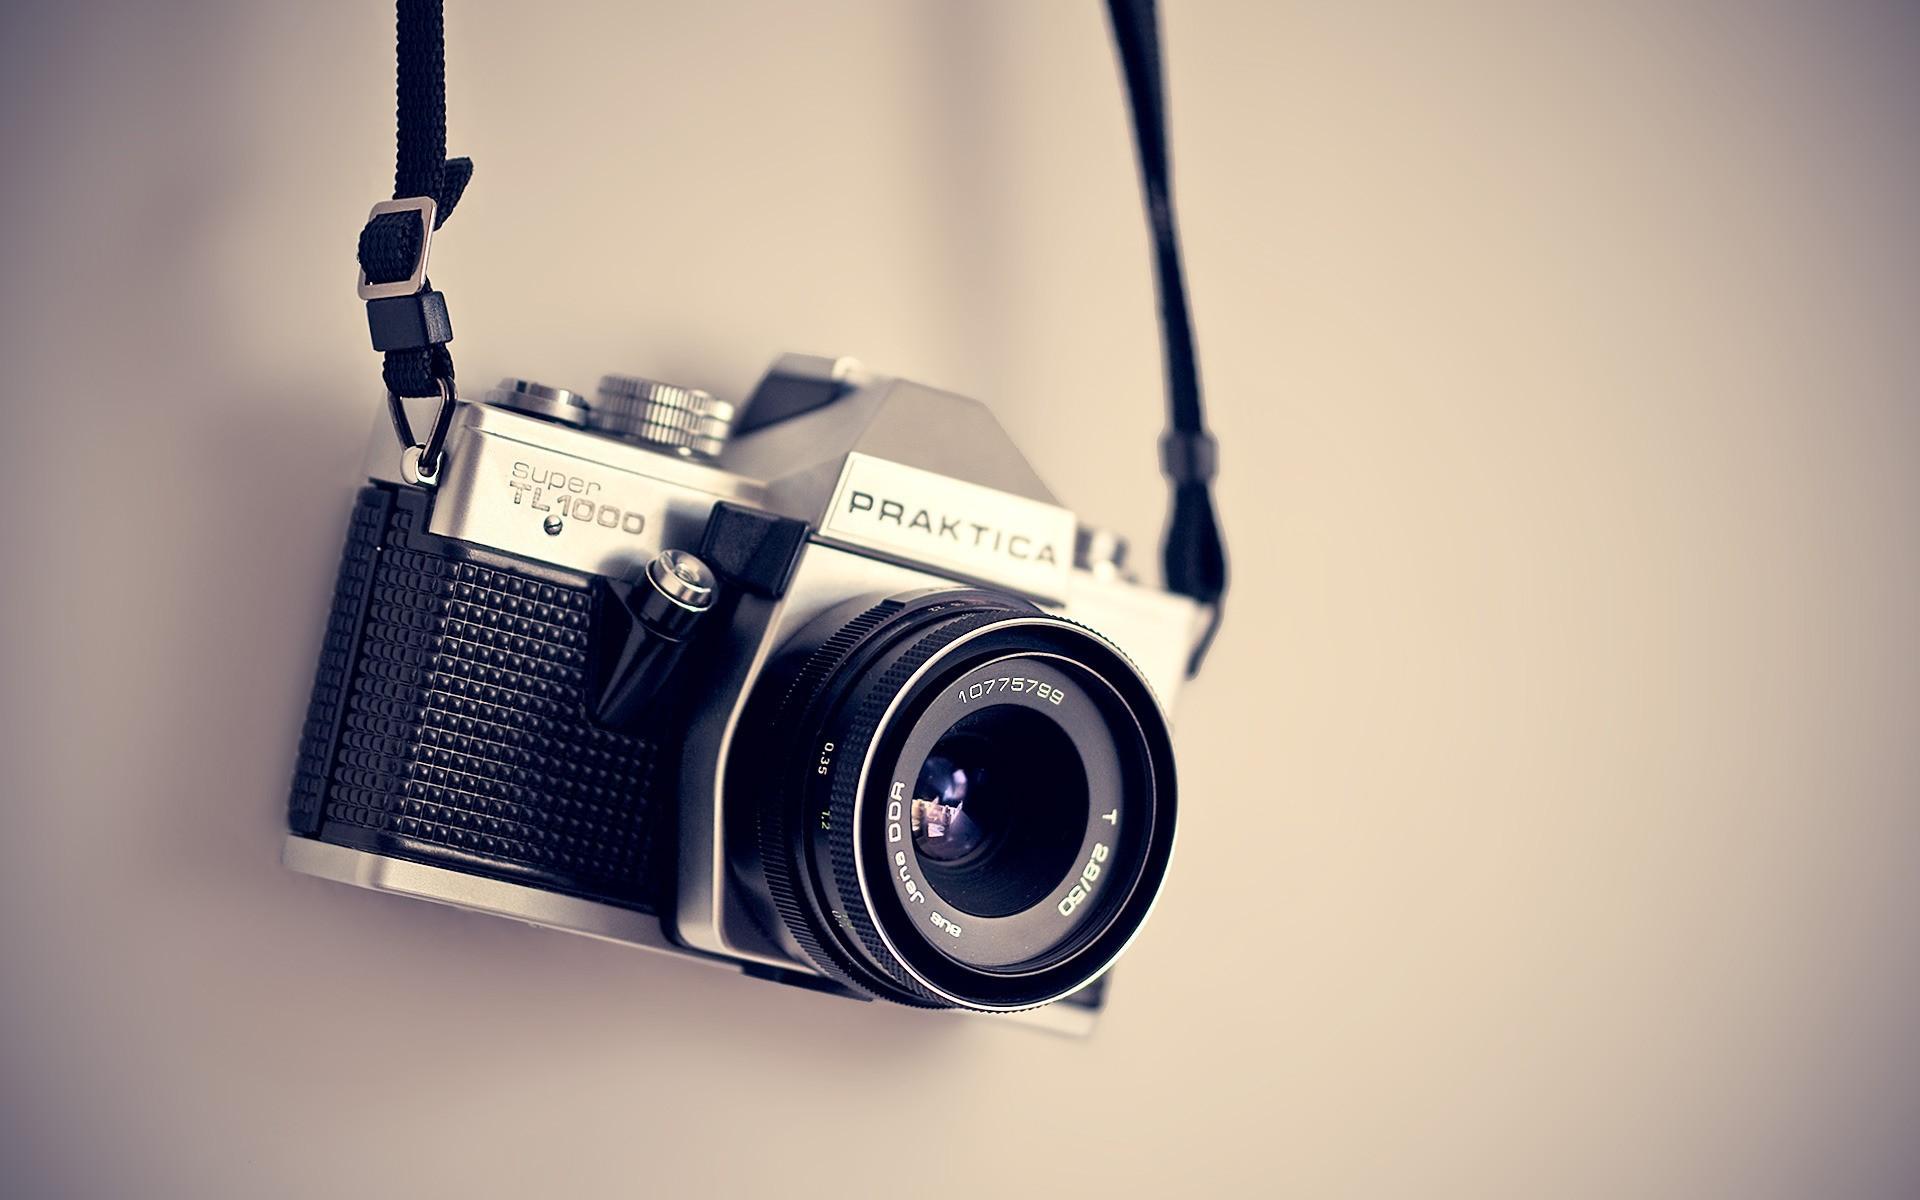 1920x1200 Cameras wallpaper